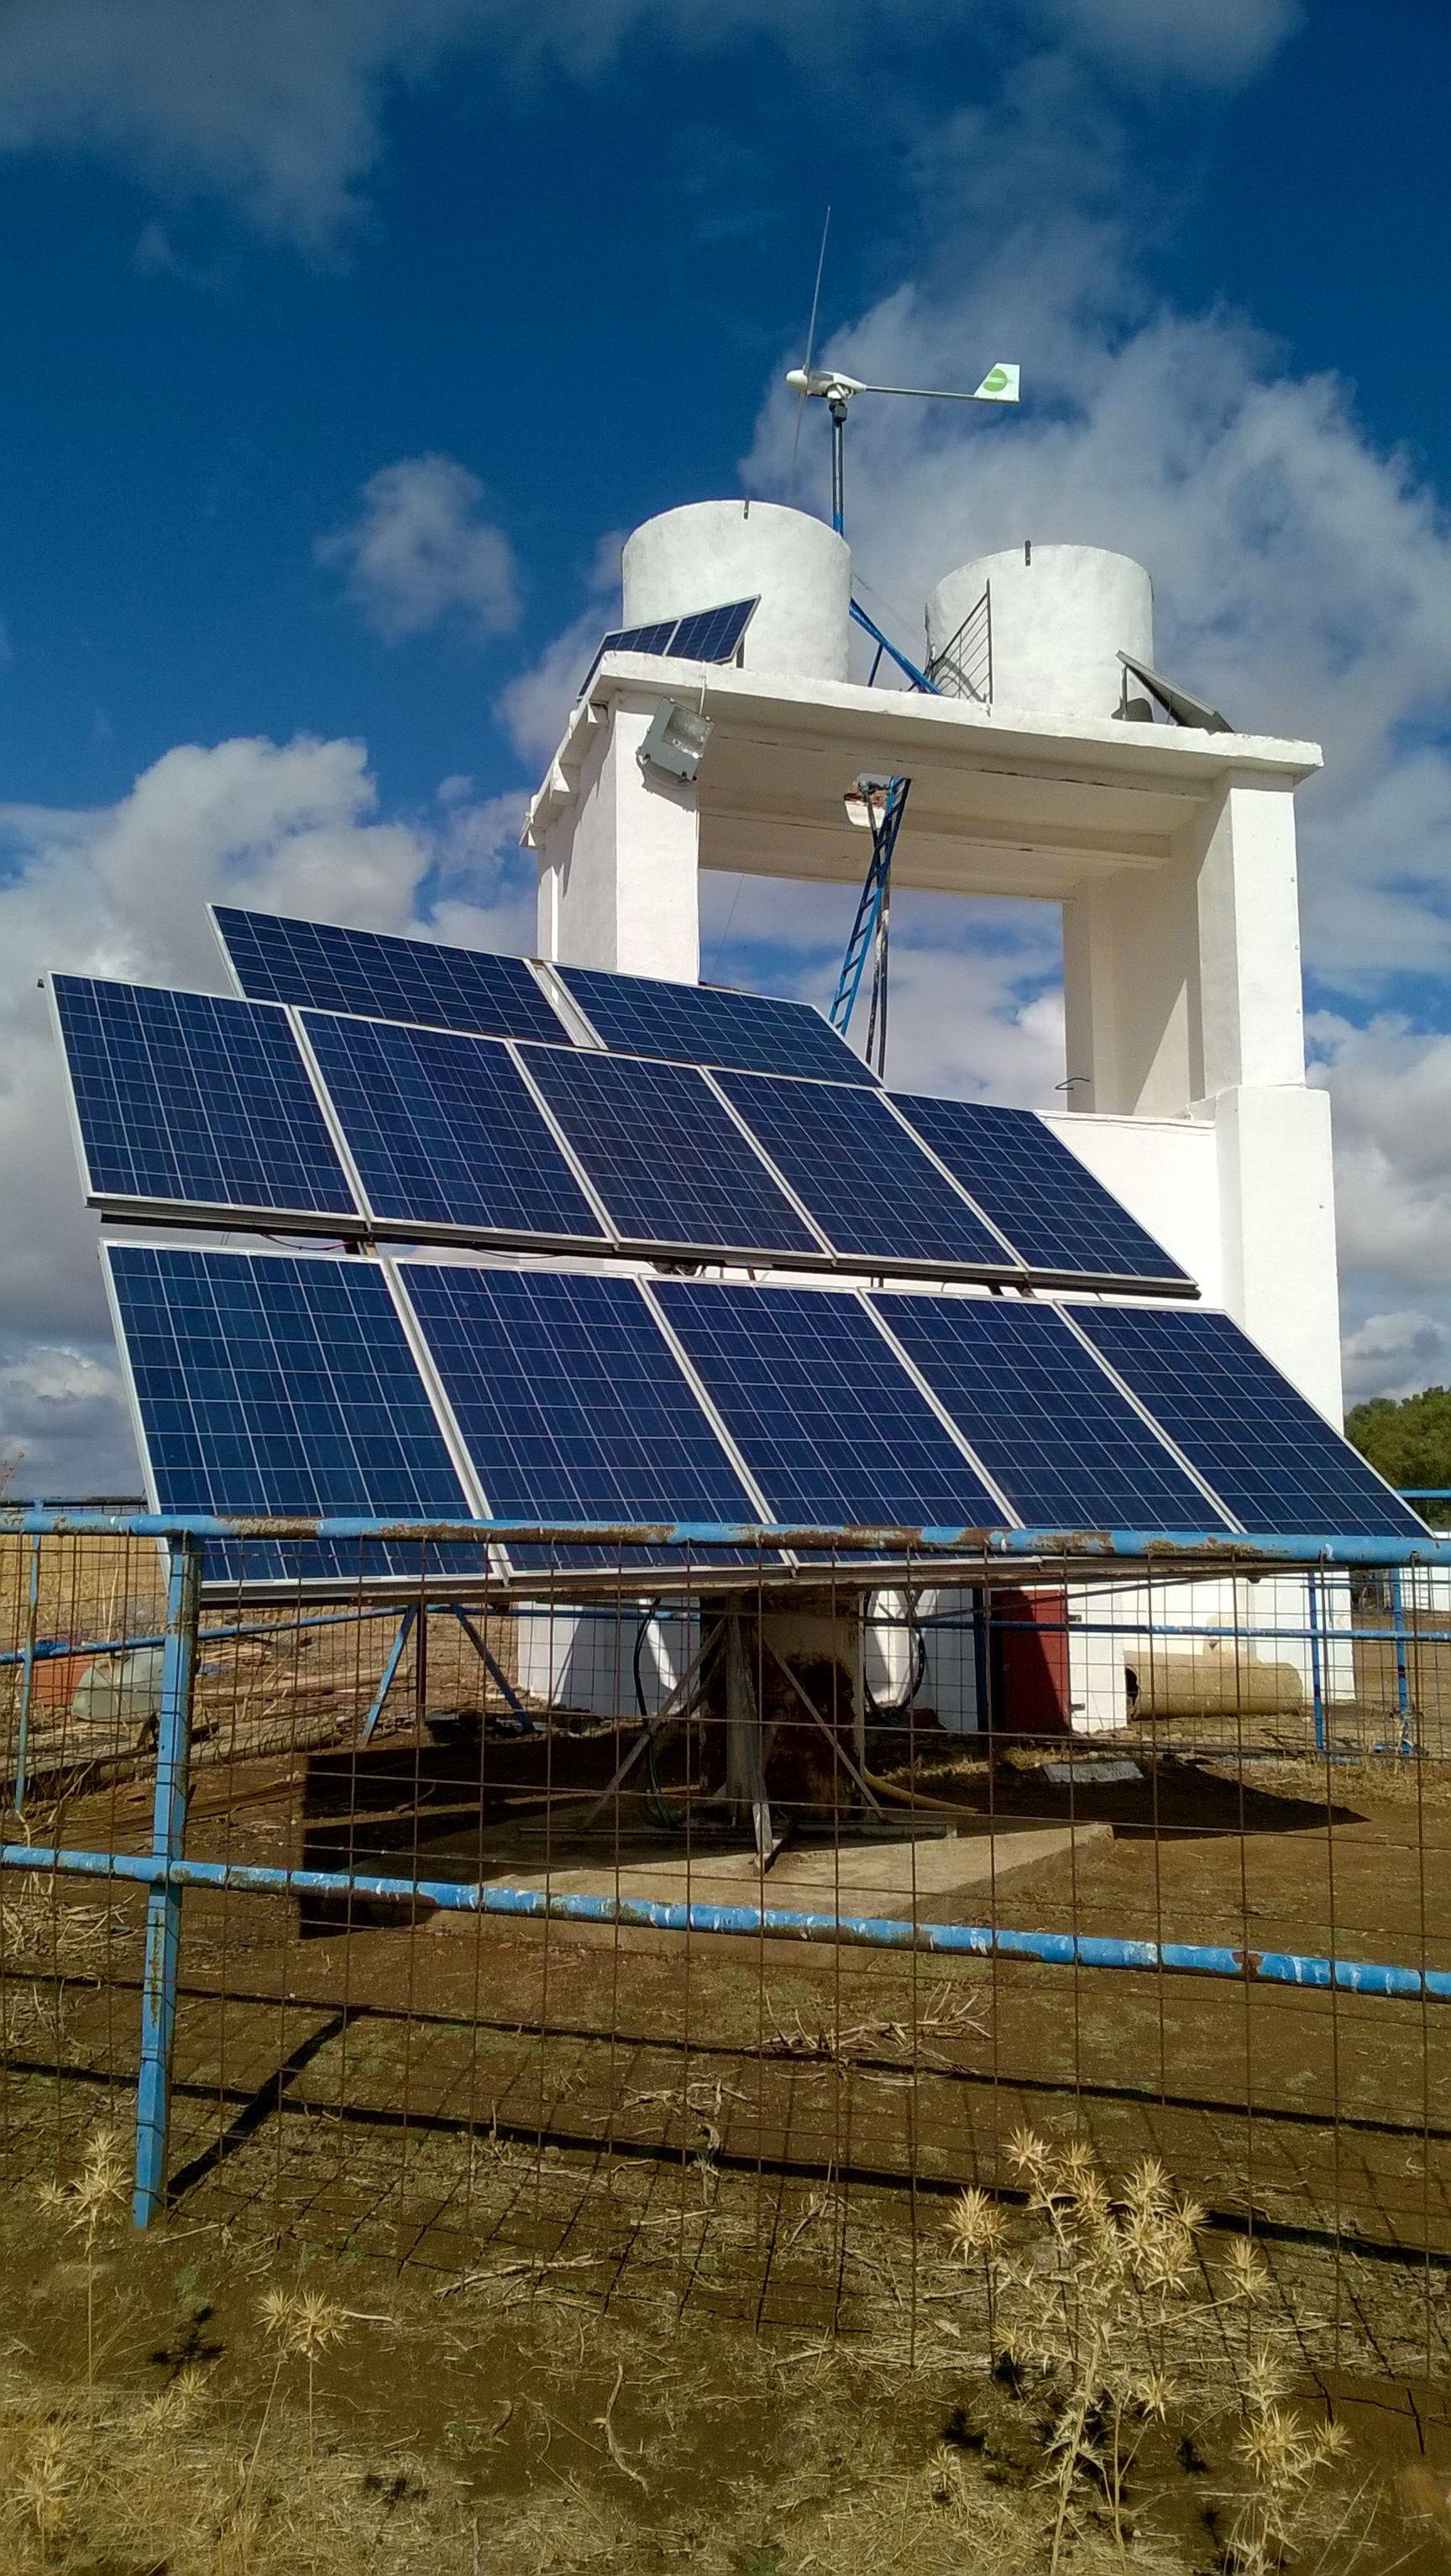 Instalacion solar fotovoltaica + eolica